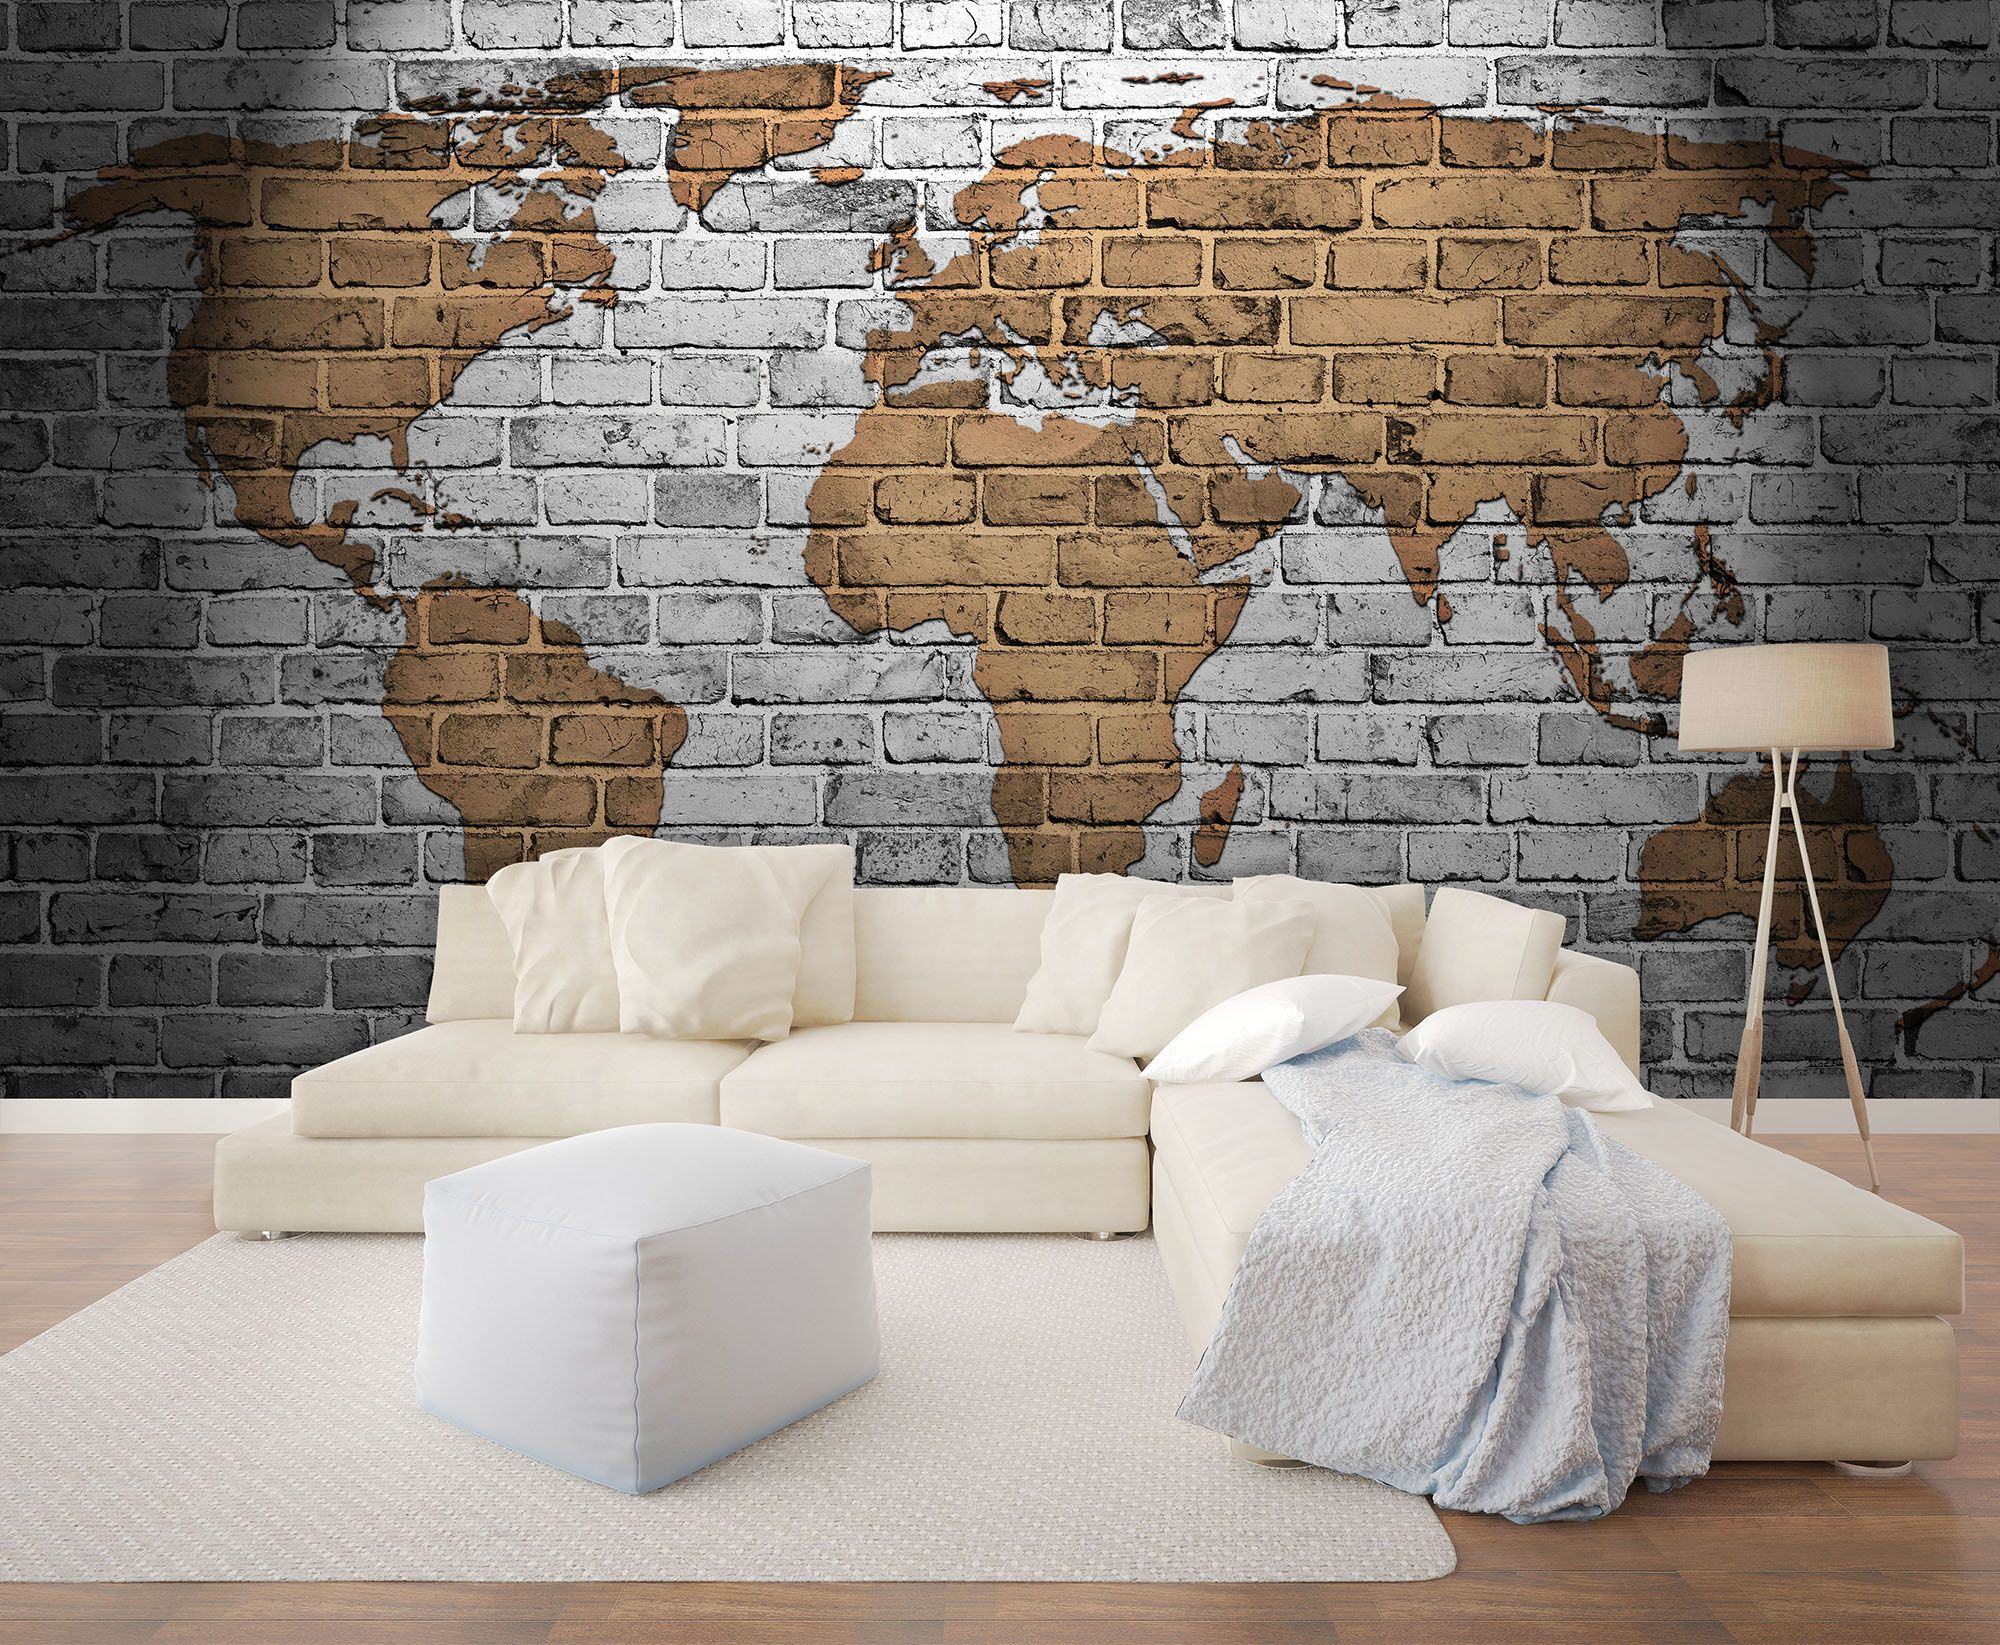 World Map Wallpaper Mural Brick Effect Wallpaper Brick Effect Wallpaper World Map Wallpaper High Quality Wallpapers